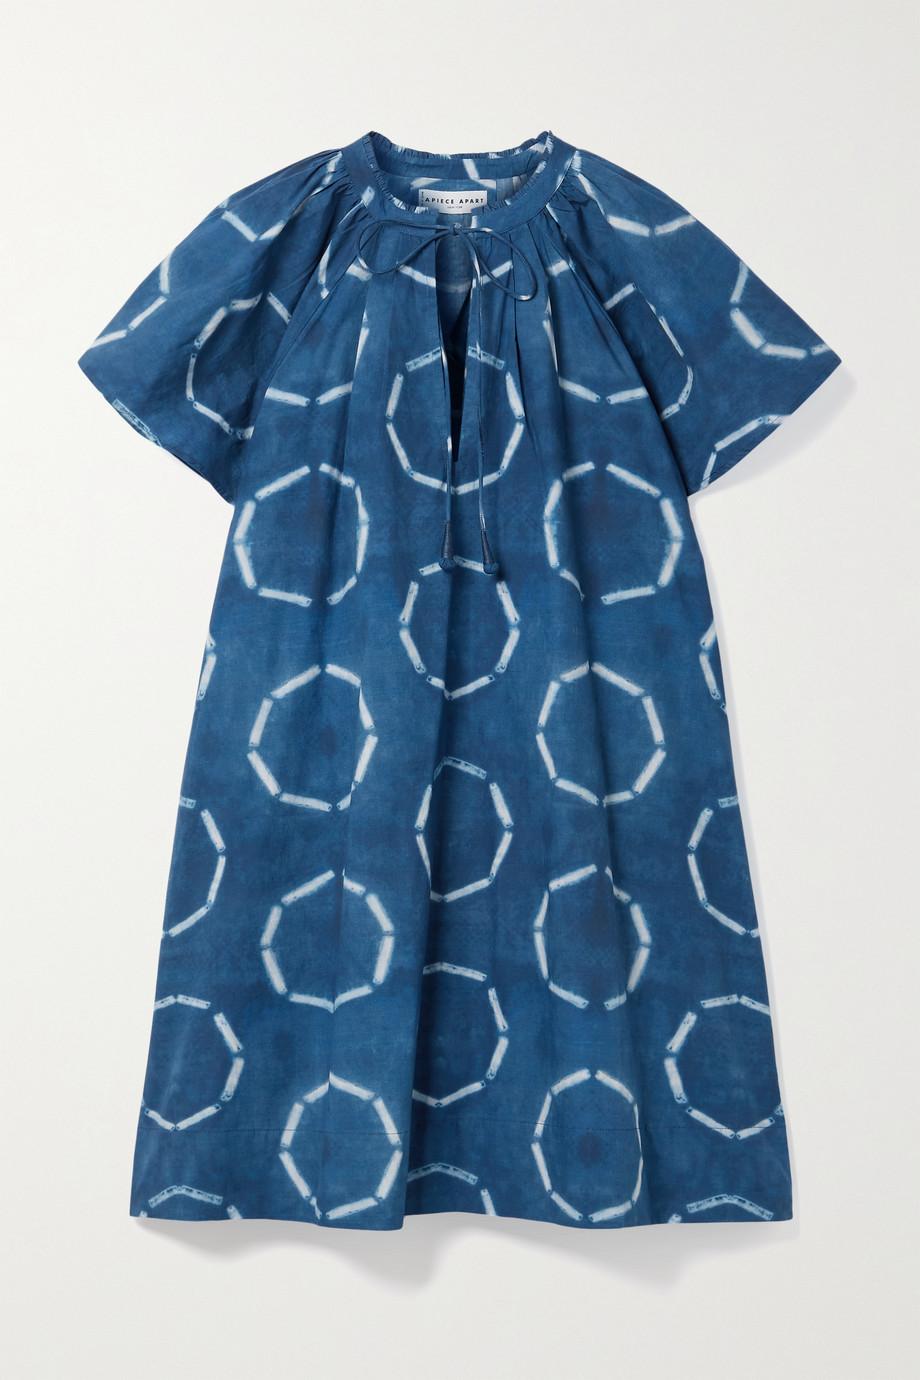 APIECE APART Sur gathered tie-dyed organic cotton-poplin mini dress